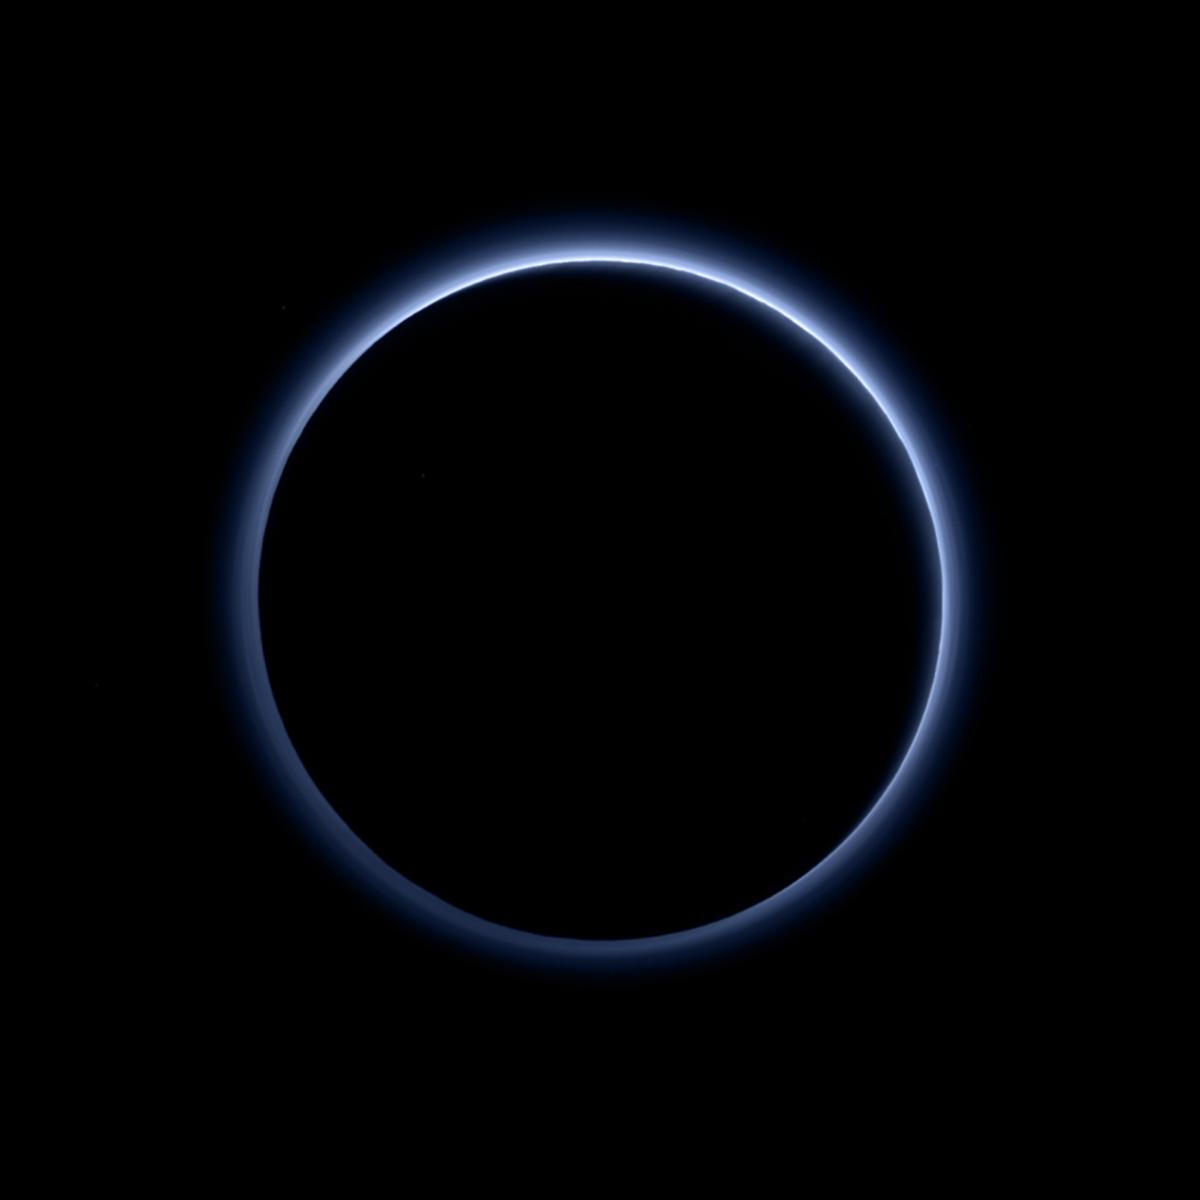 10-9-15 Pluto Blue Skies